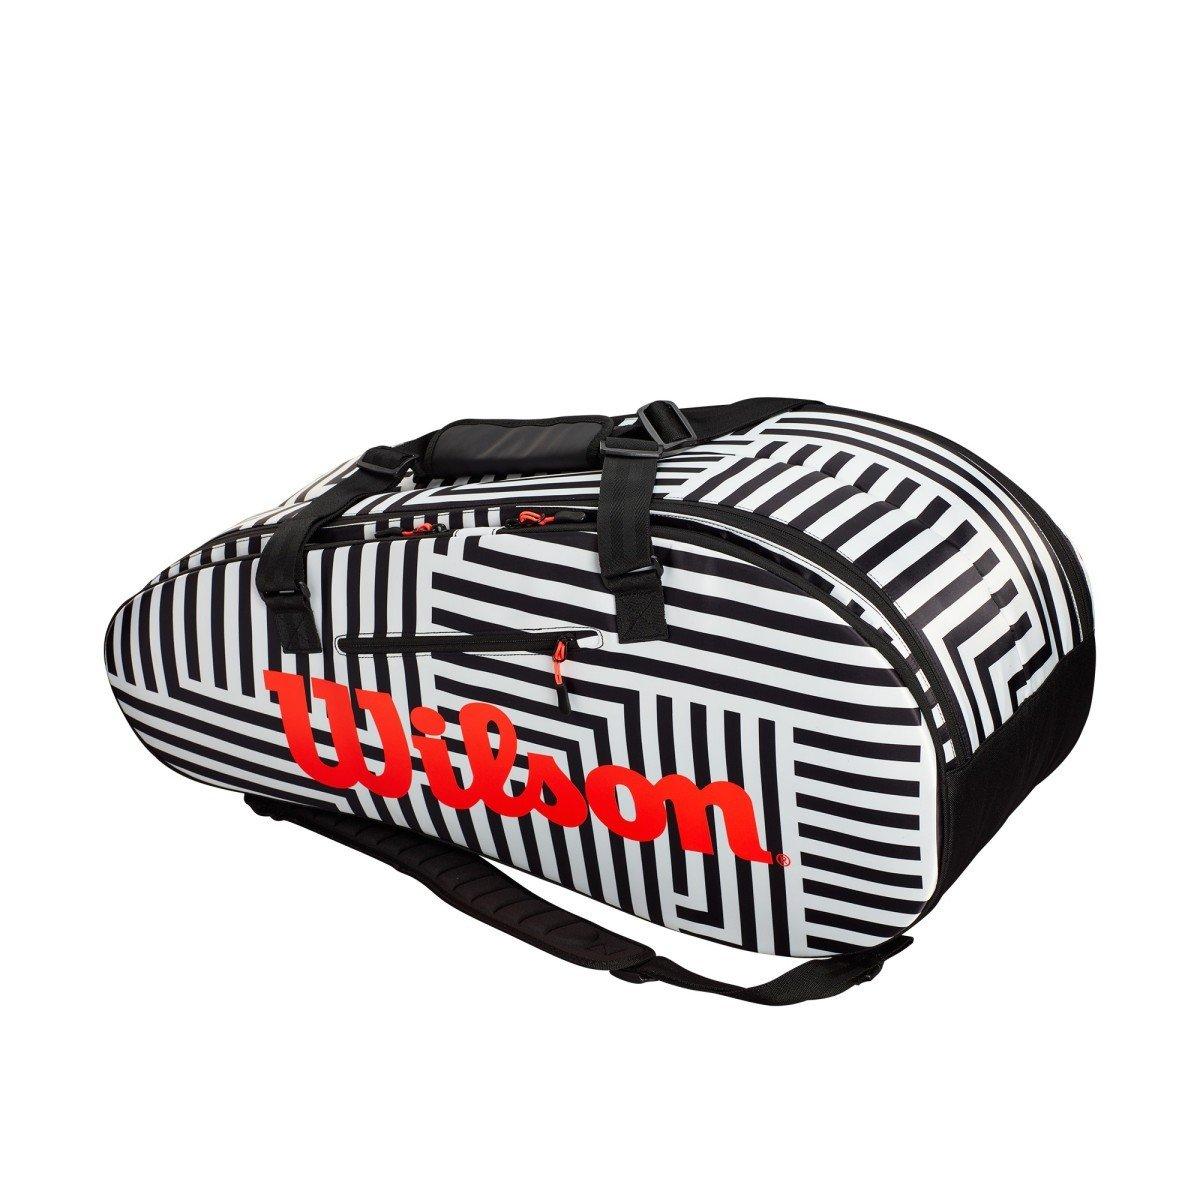 Wilson Tennis Bag – Super Tour 2 Compartments - Bold Edition